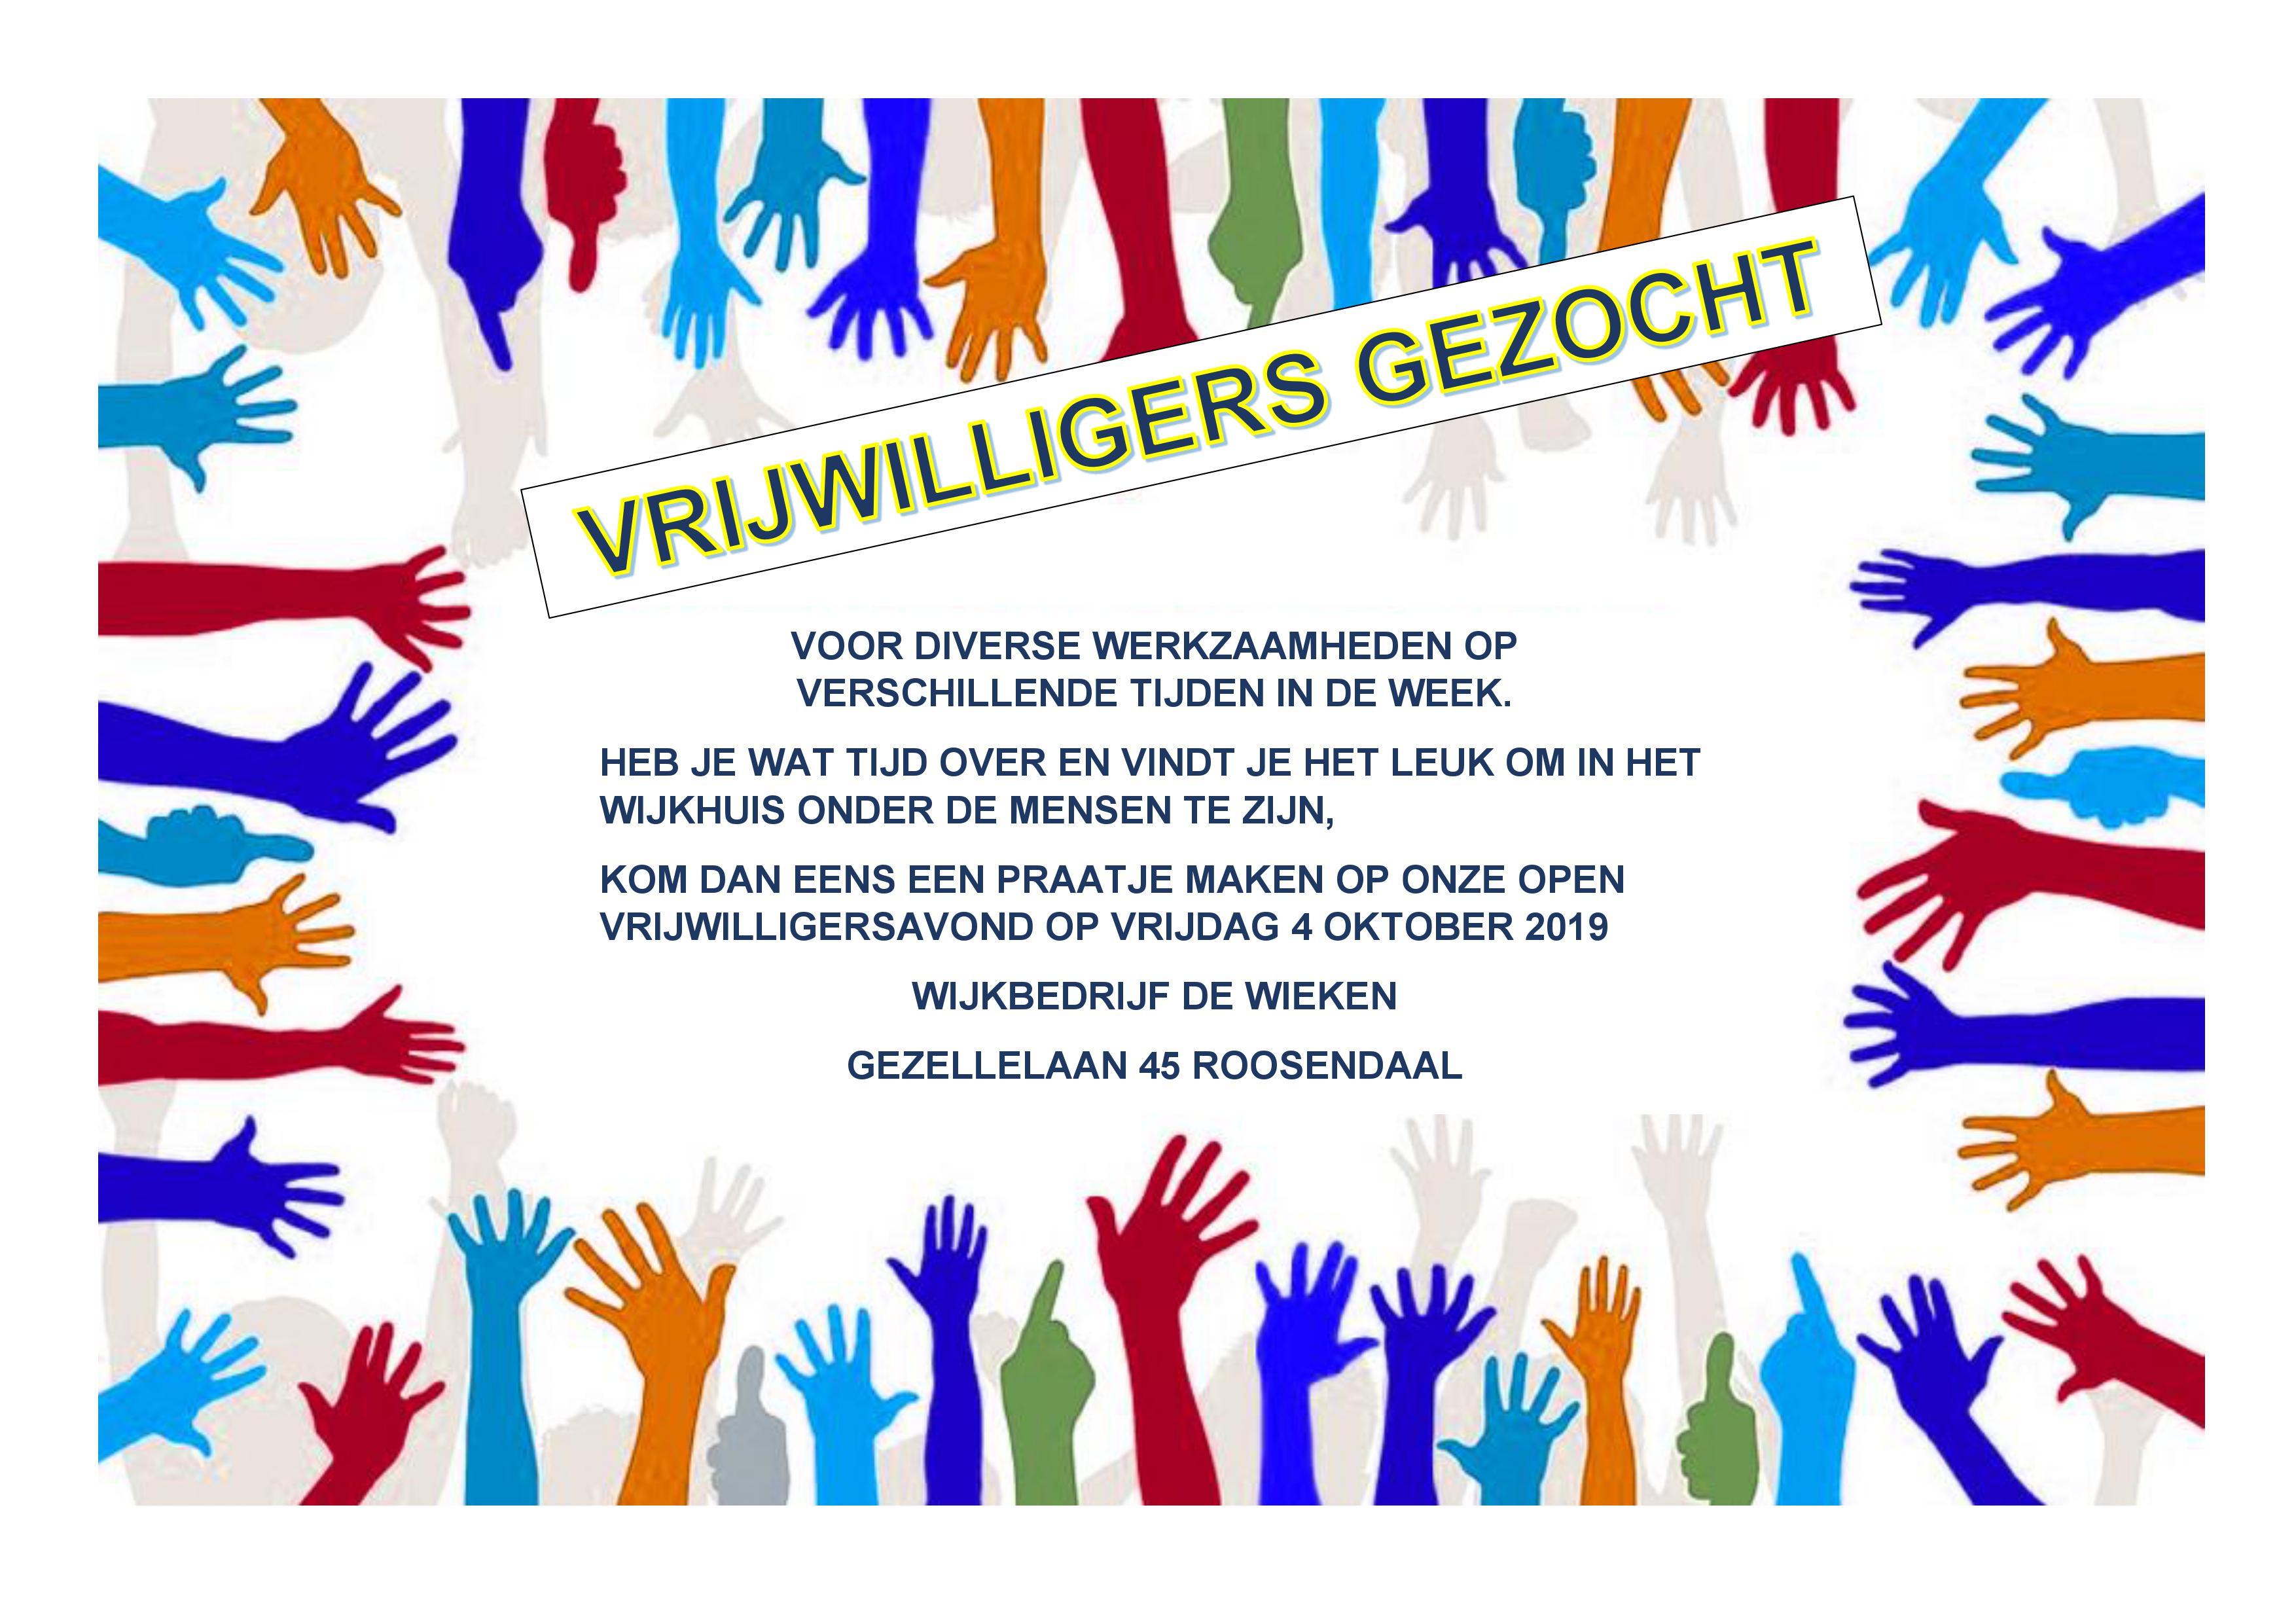 Vrijwilligersavond 4 oktober 2019